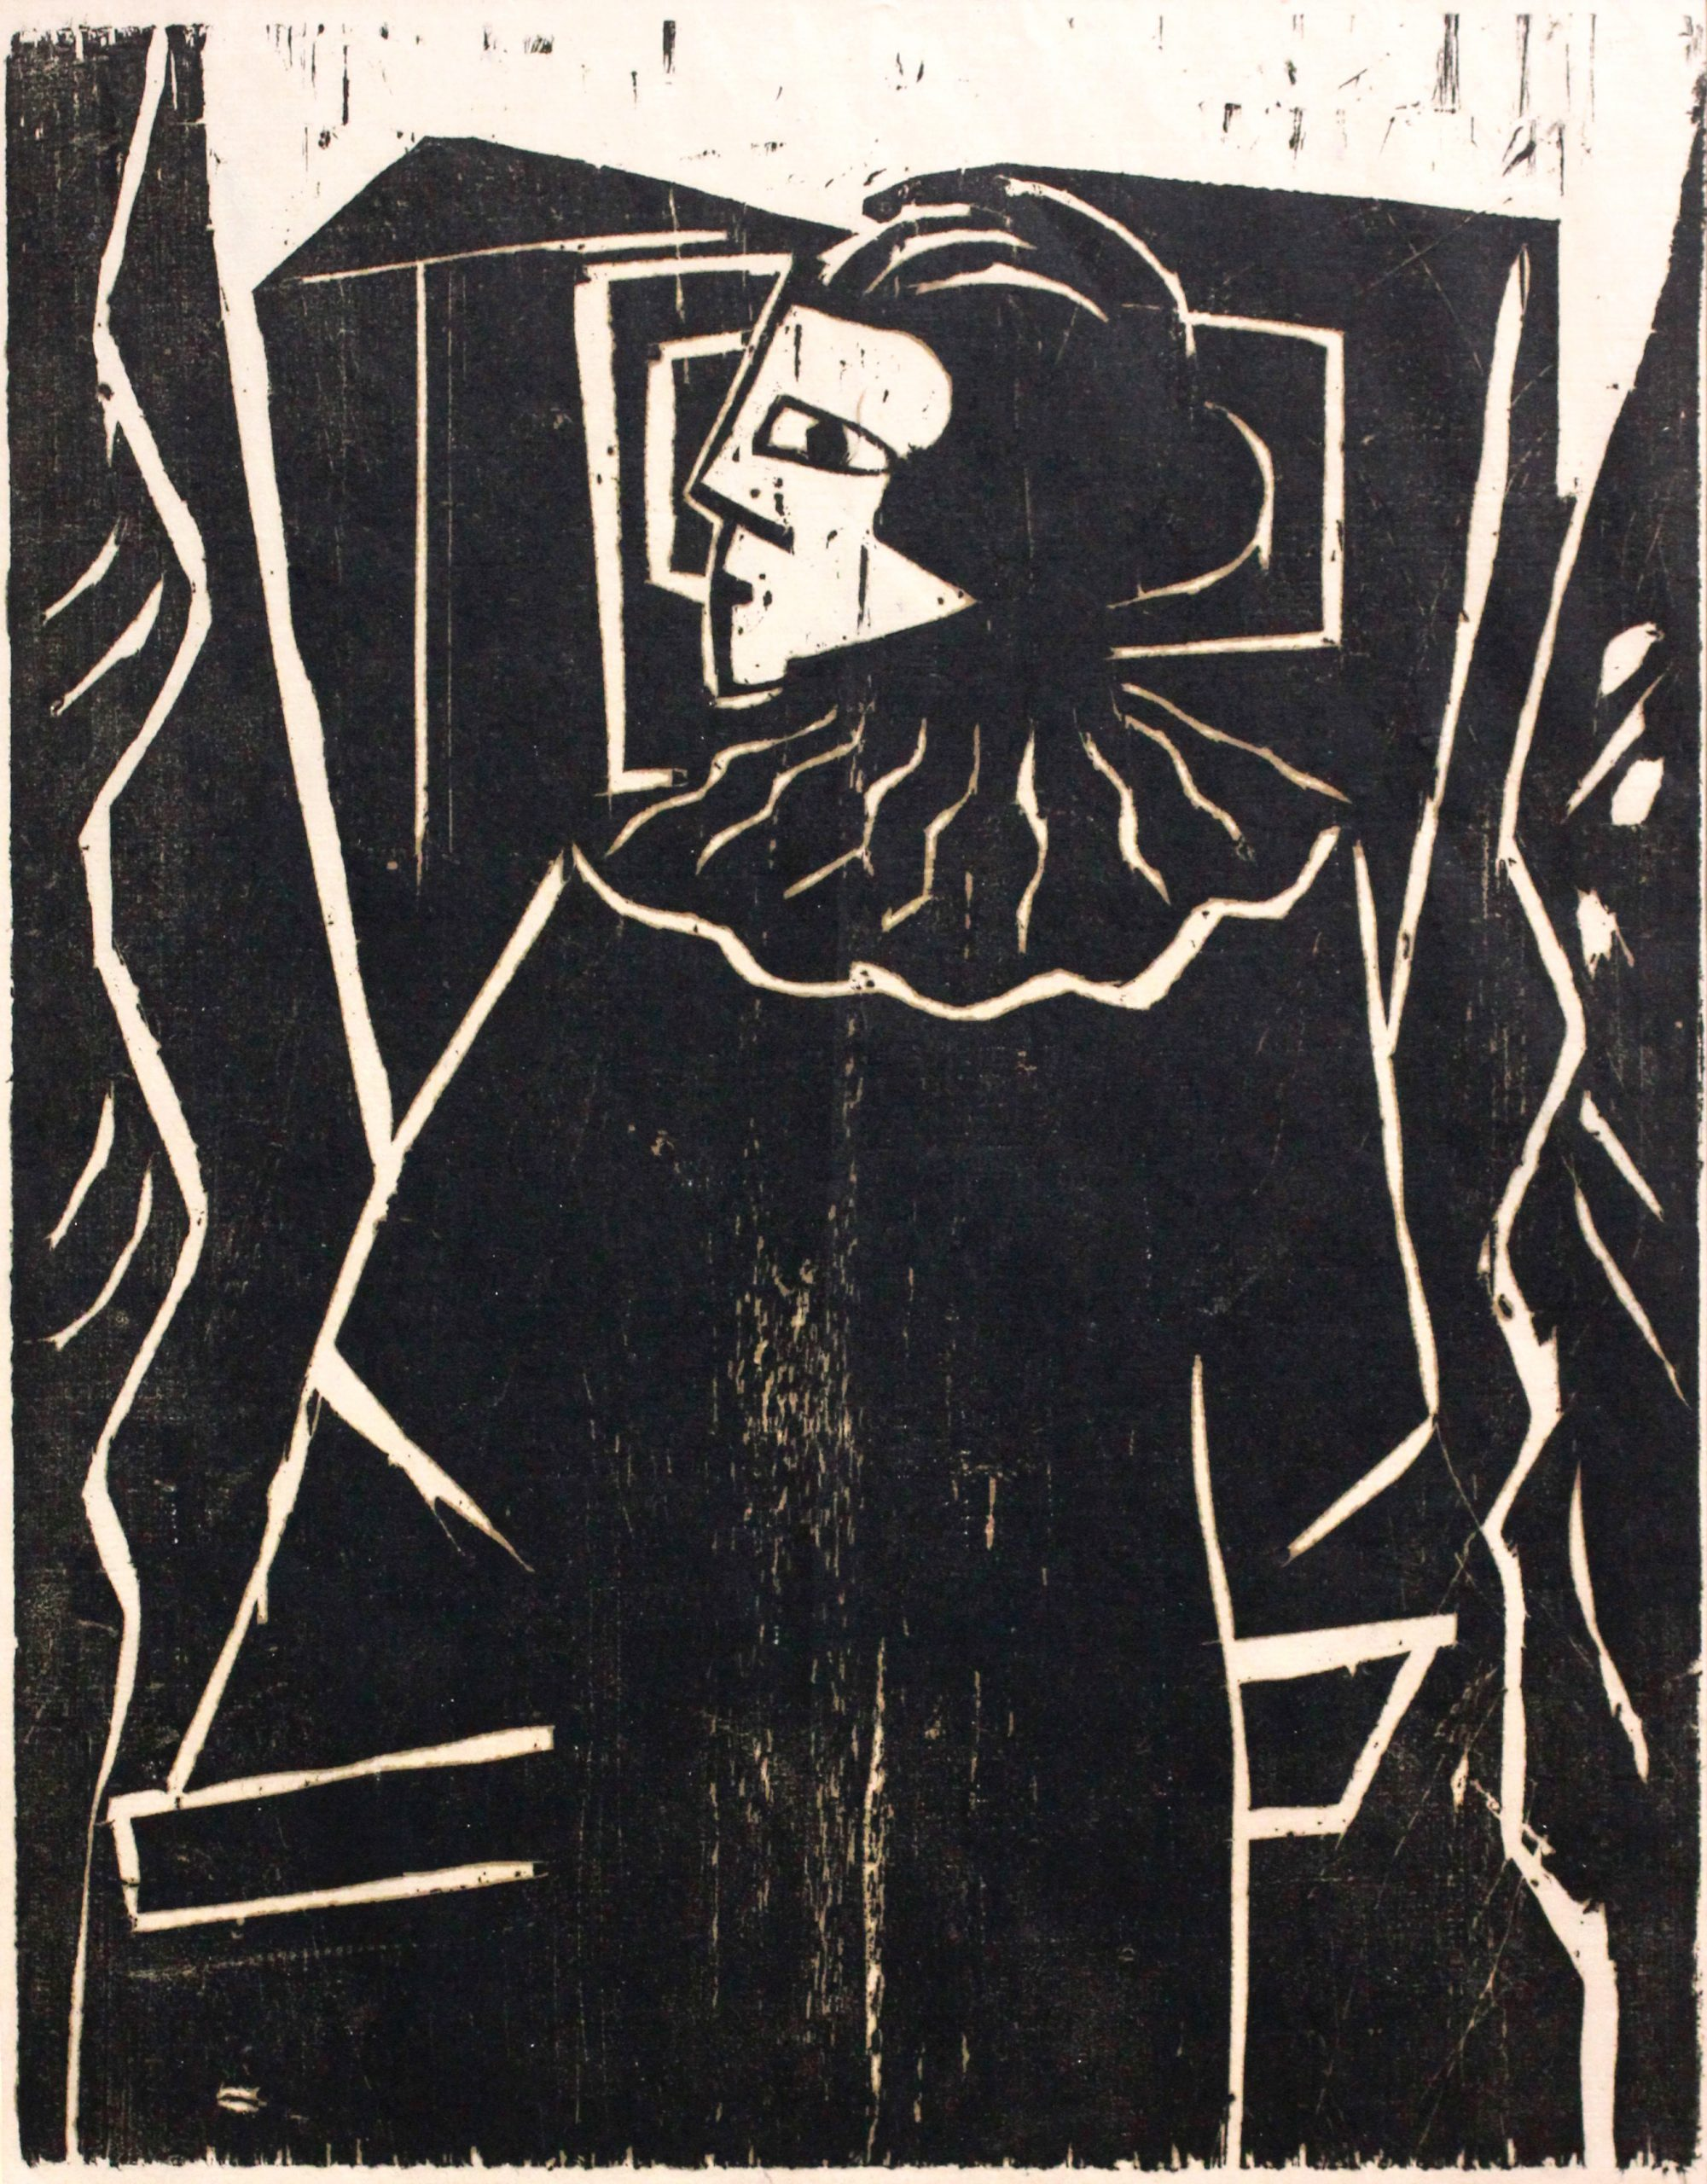 Am Fenster (At the Window) by Josef Achmann